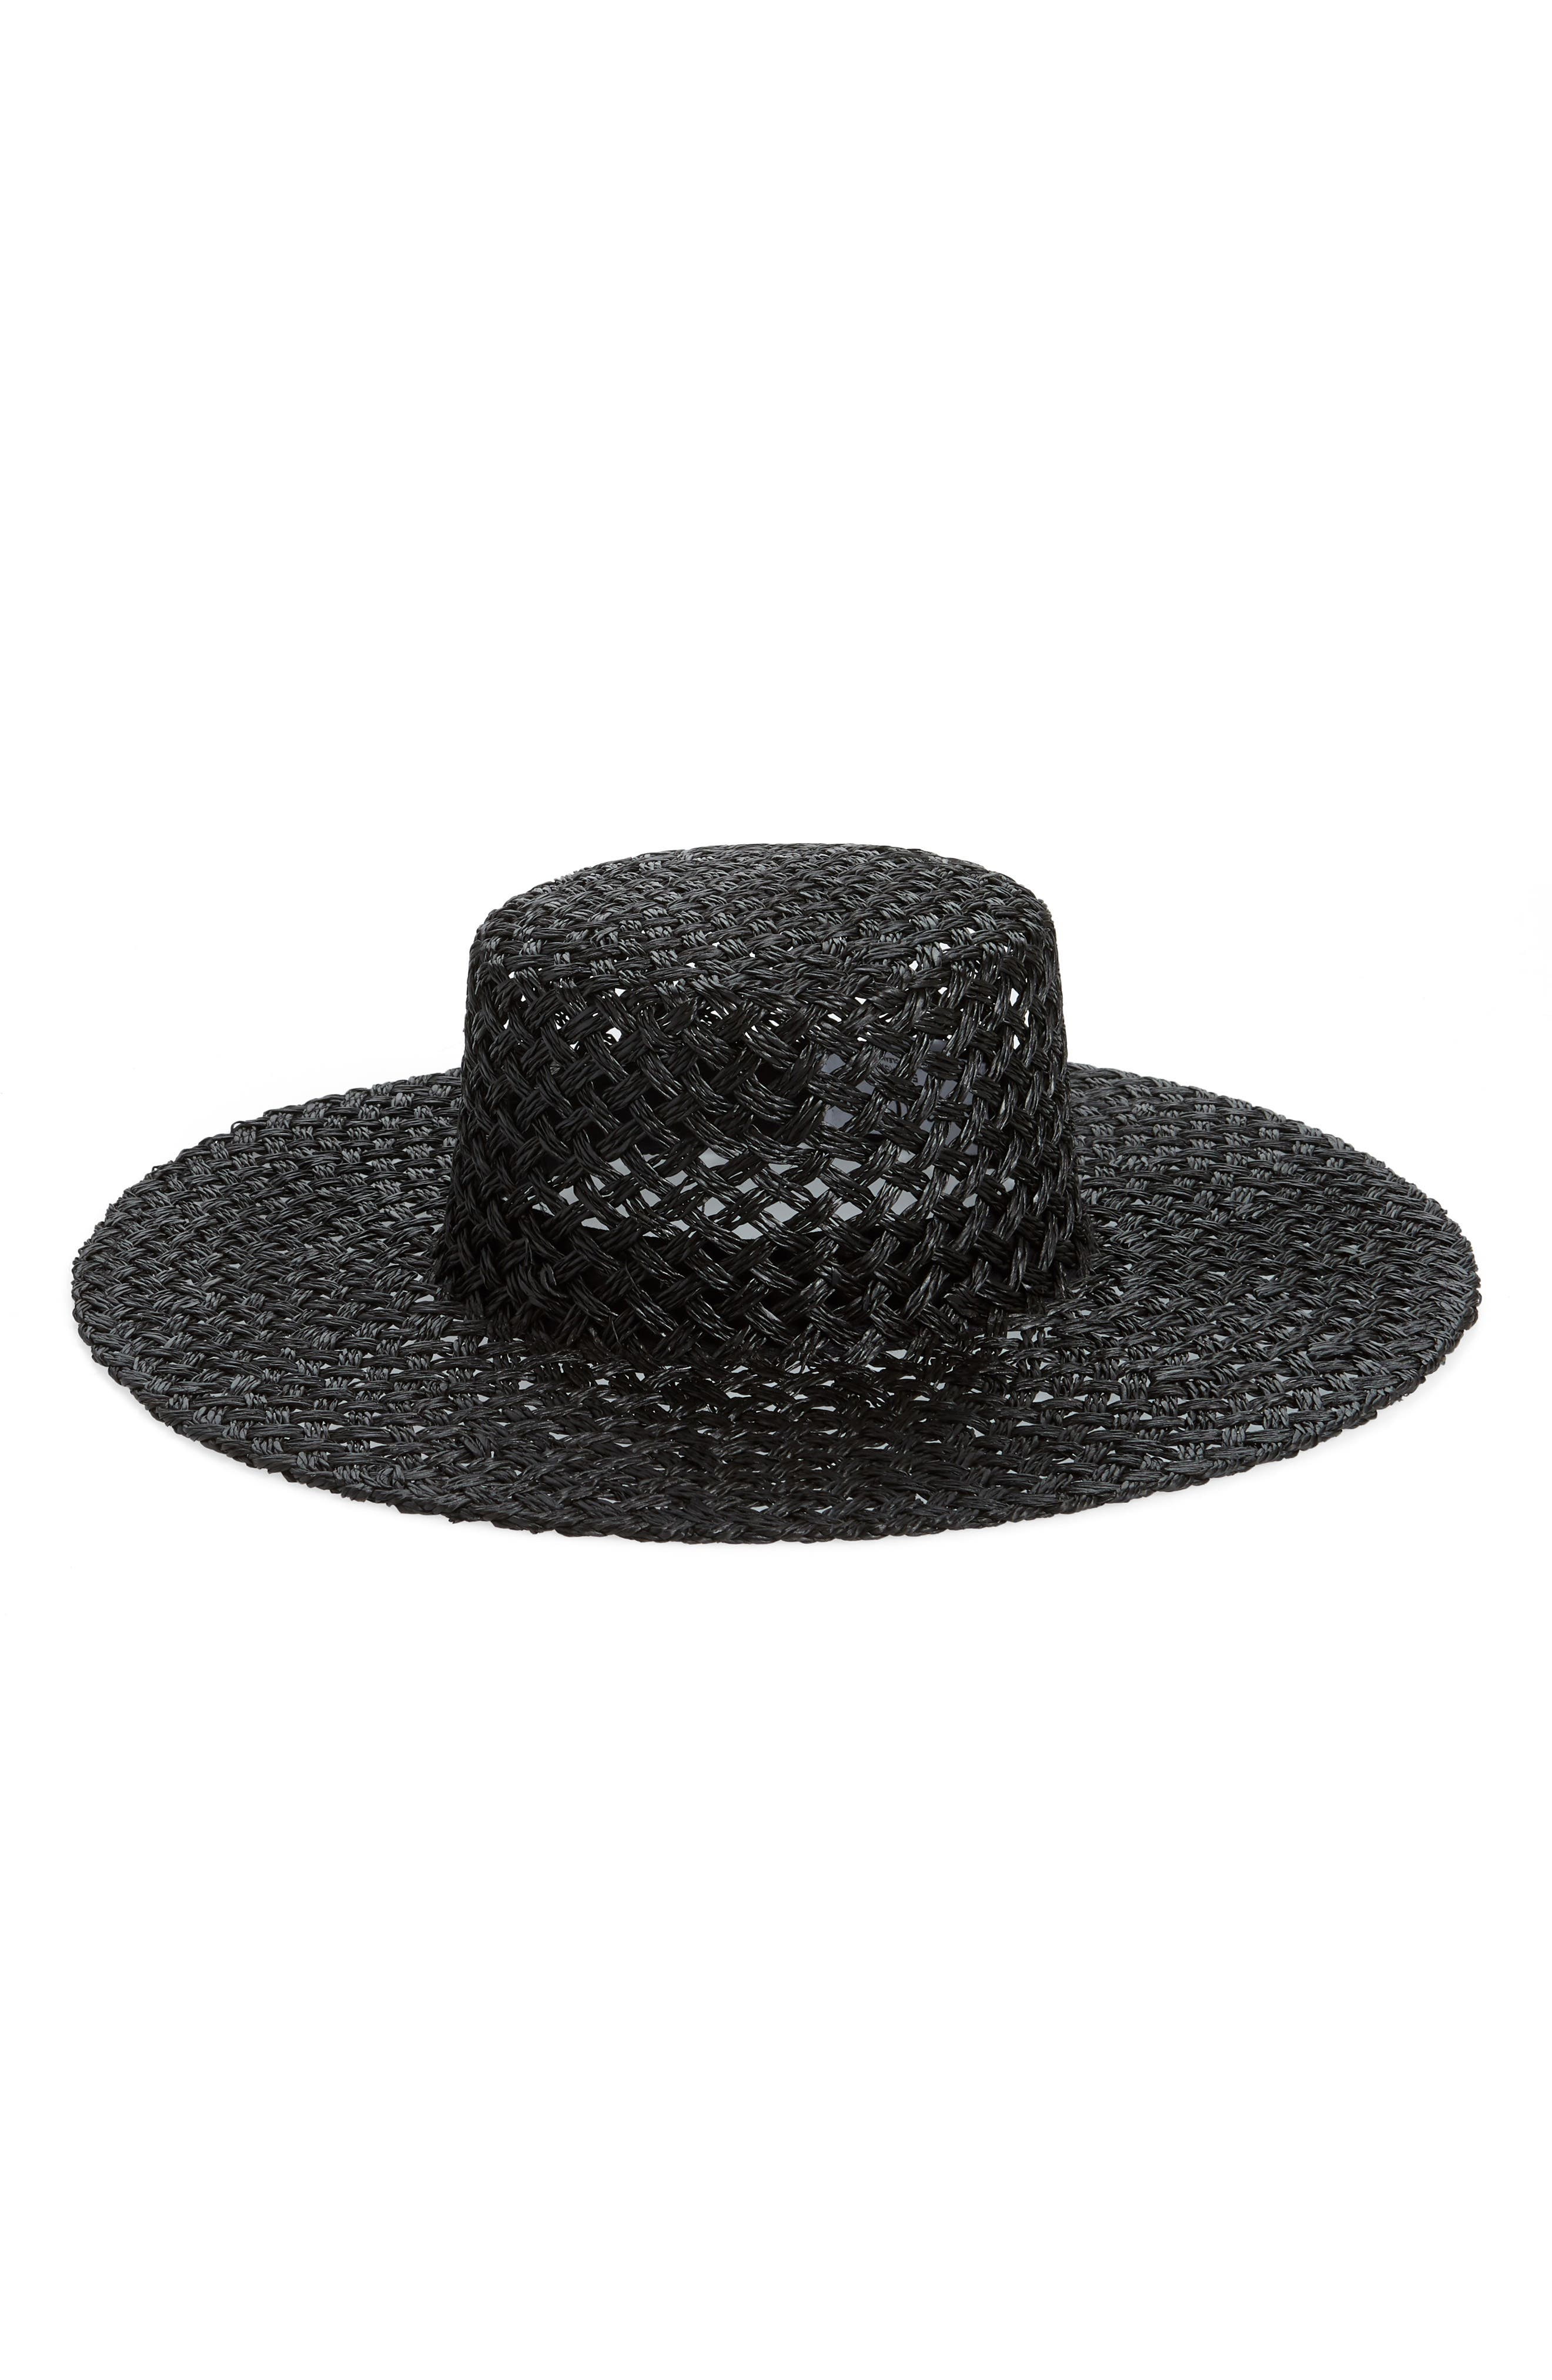 LACK OF COLOR Sunnydip Noir Wide Brim Woven Hat - Black in Burgundy